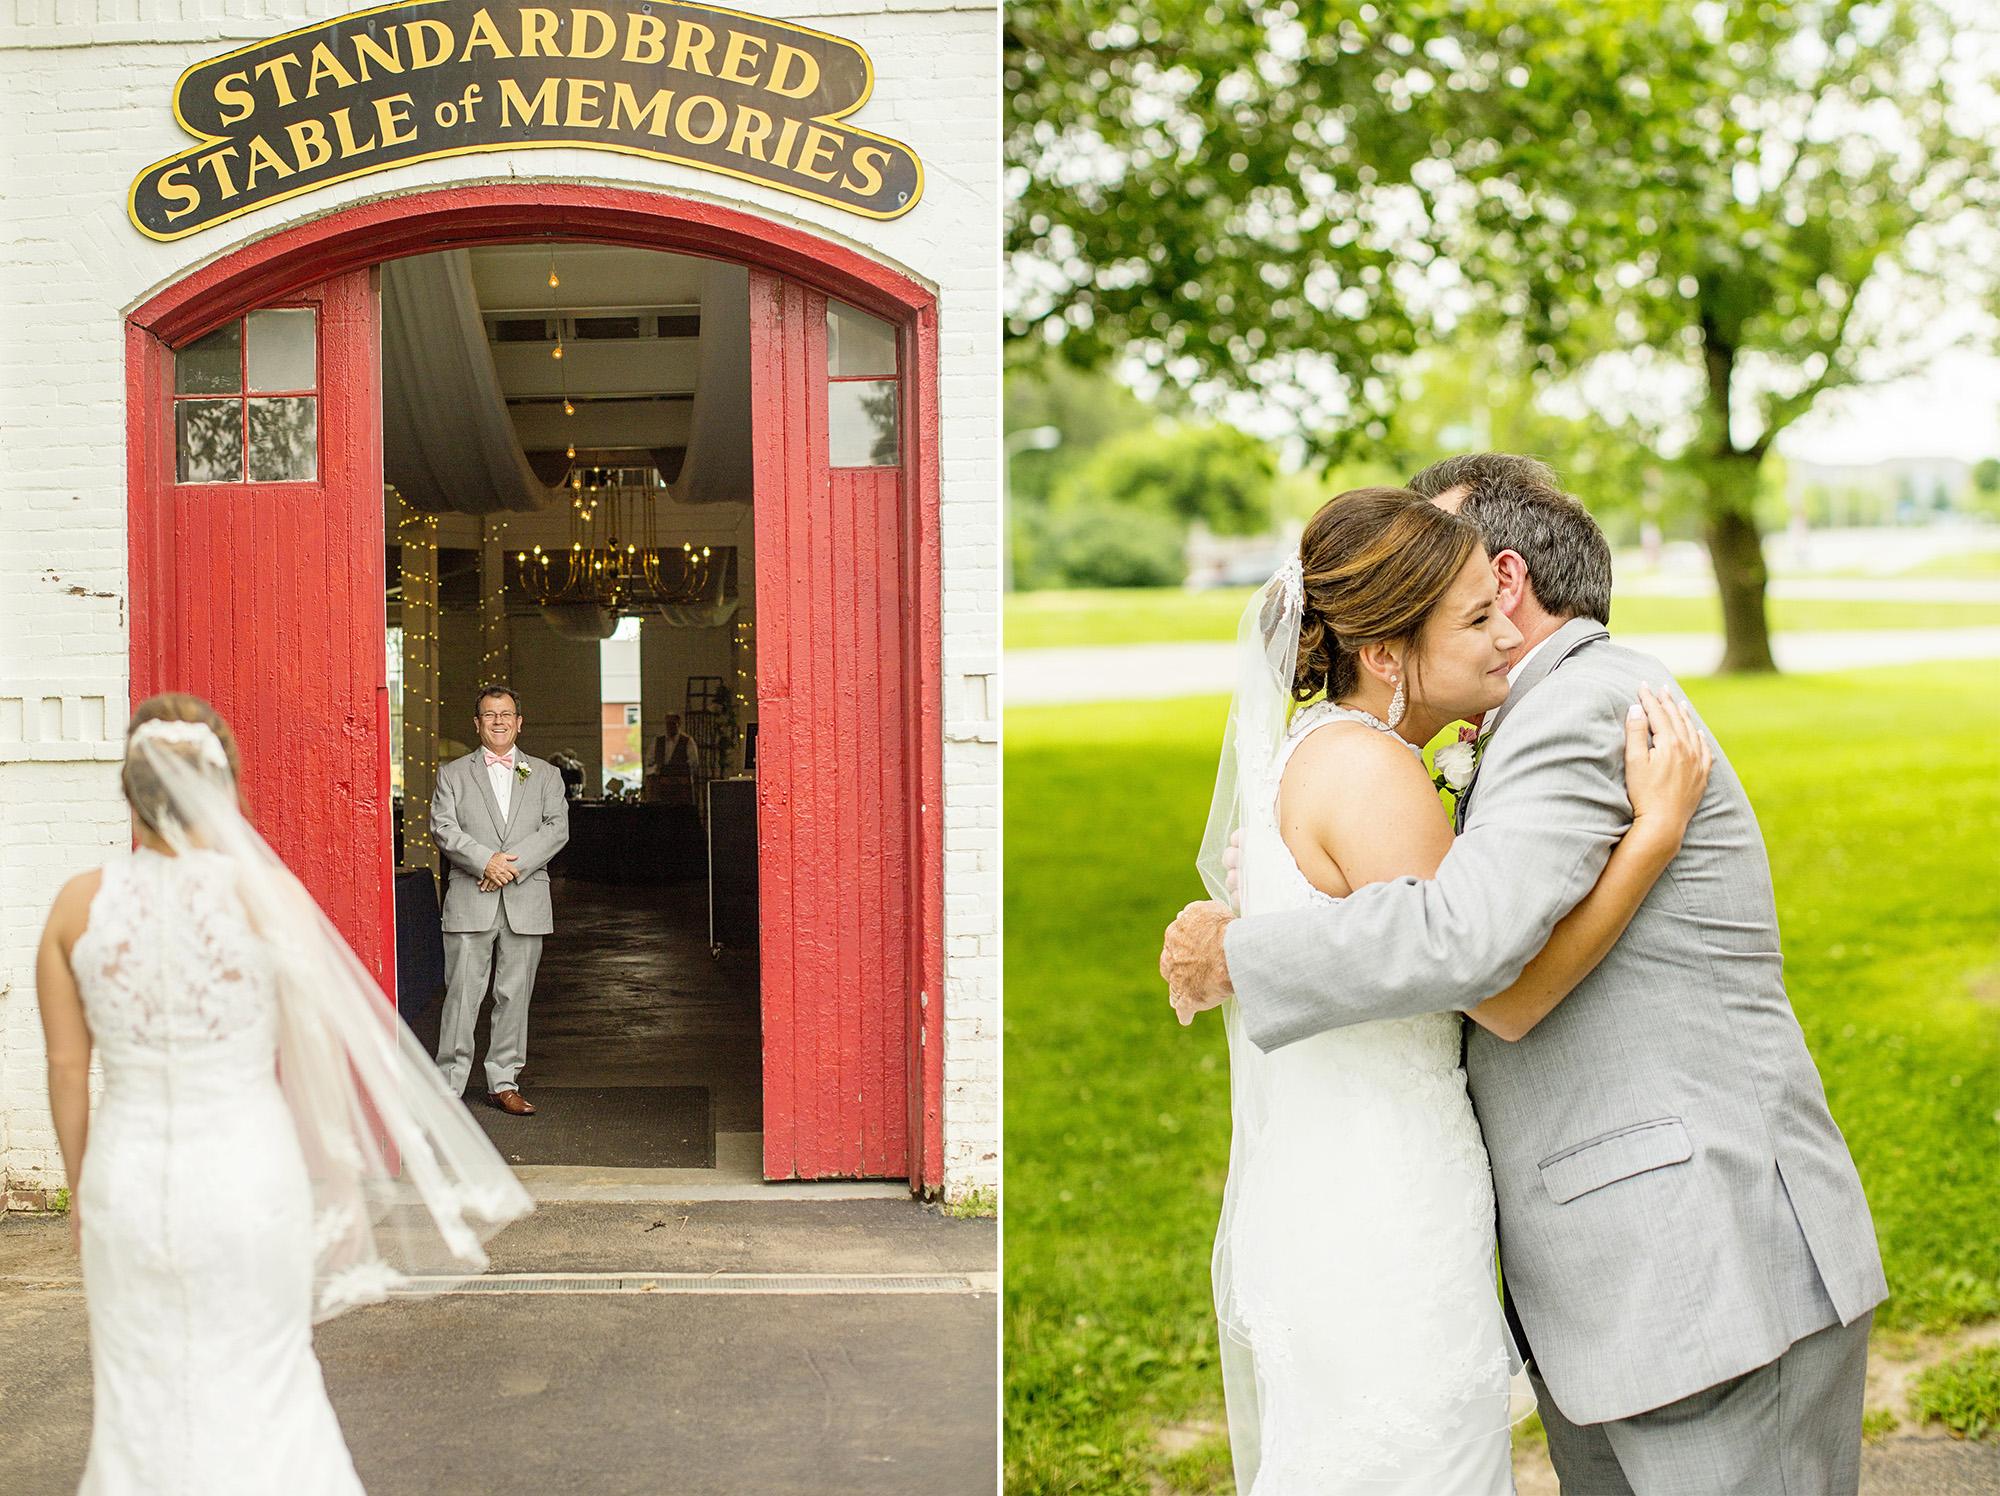 Seriously_Sabrina_Photography_Lexington_Kentucky_Round_Barn_Red_Mile_Stable_of_Memories_Wedding_Hart_42.jpg